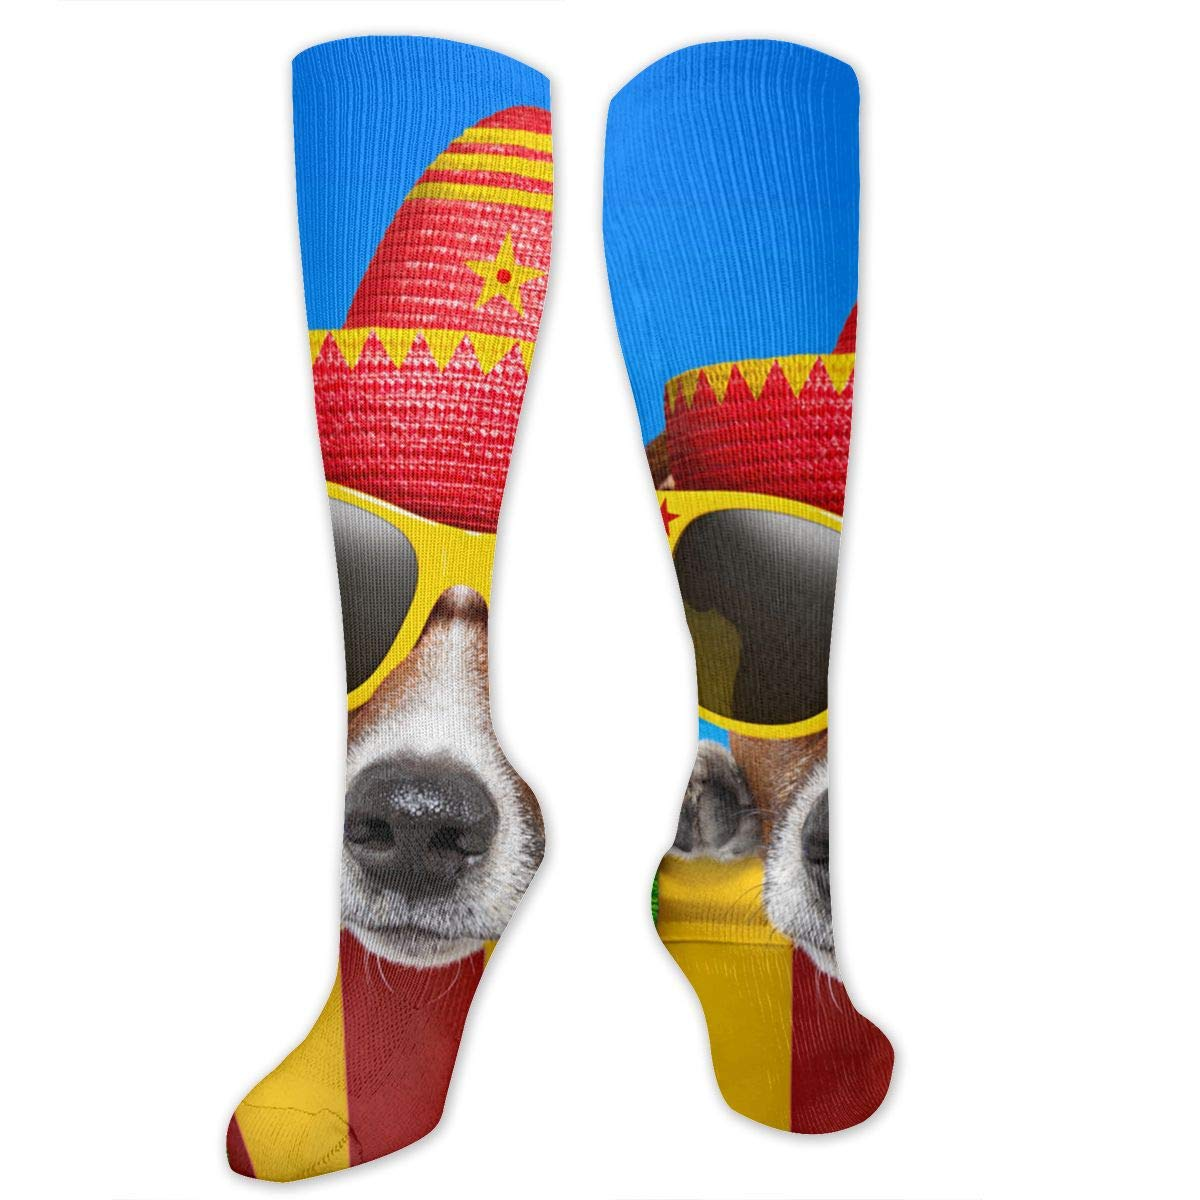 Chanwazibibiliu Dogs Colored Background Mens Colorful Dress Socks Funky Men Multicolored Pattern Fashionable Fun Crew Cotton Socks